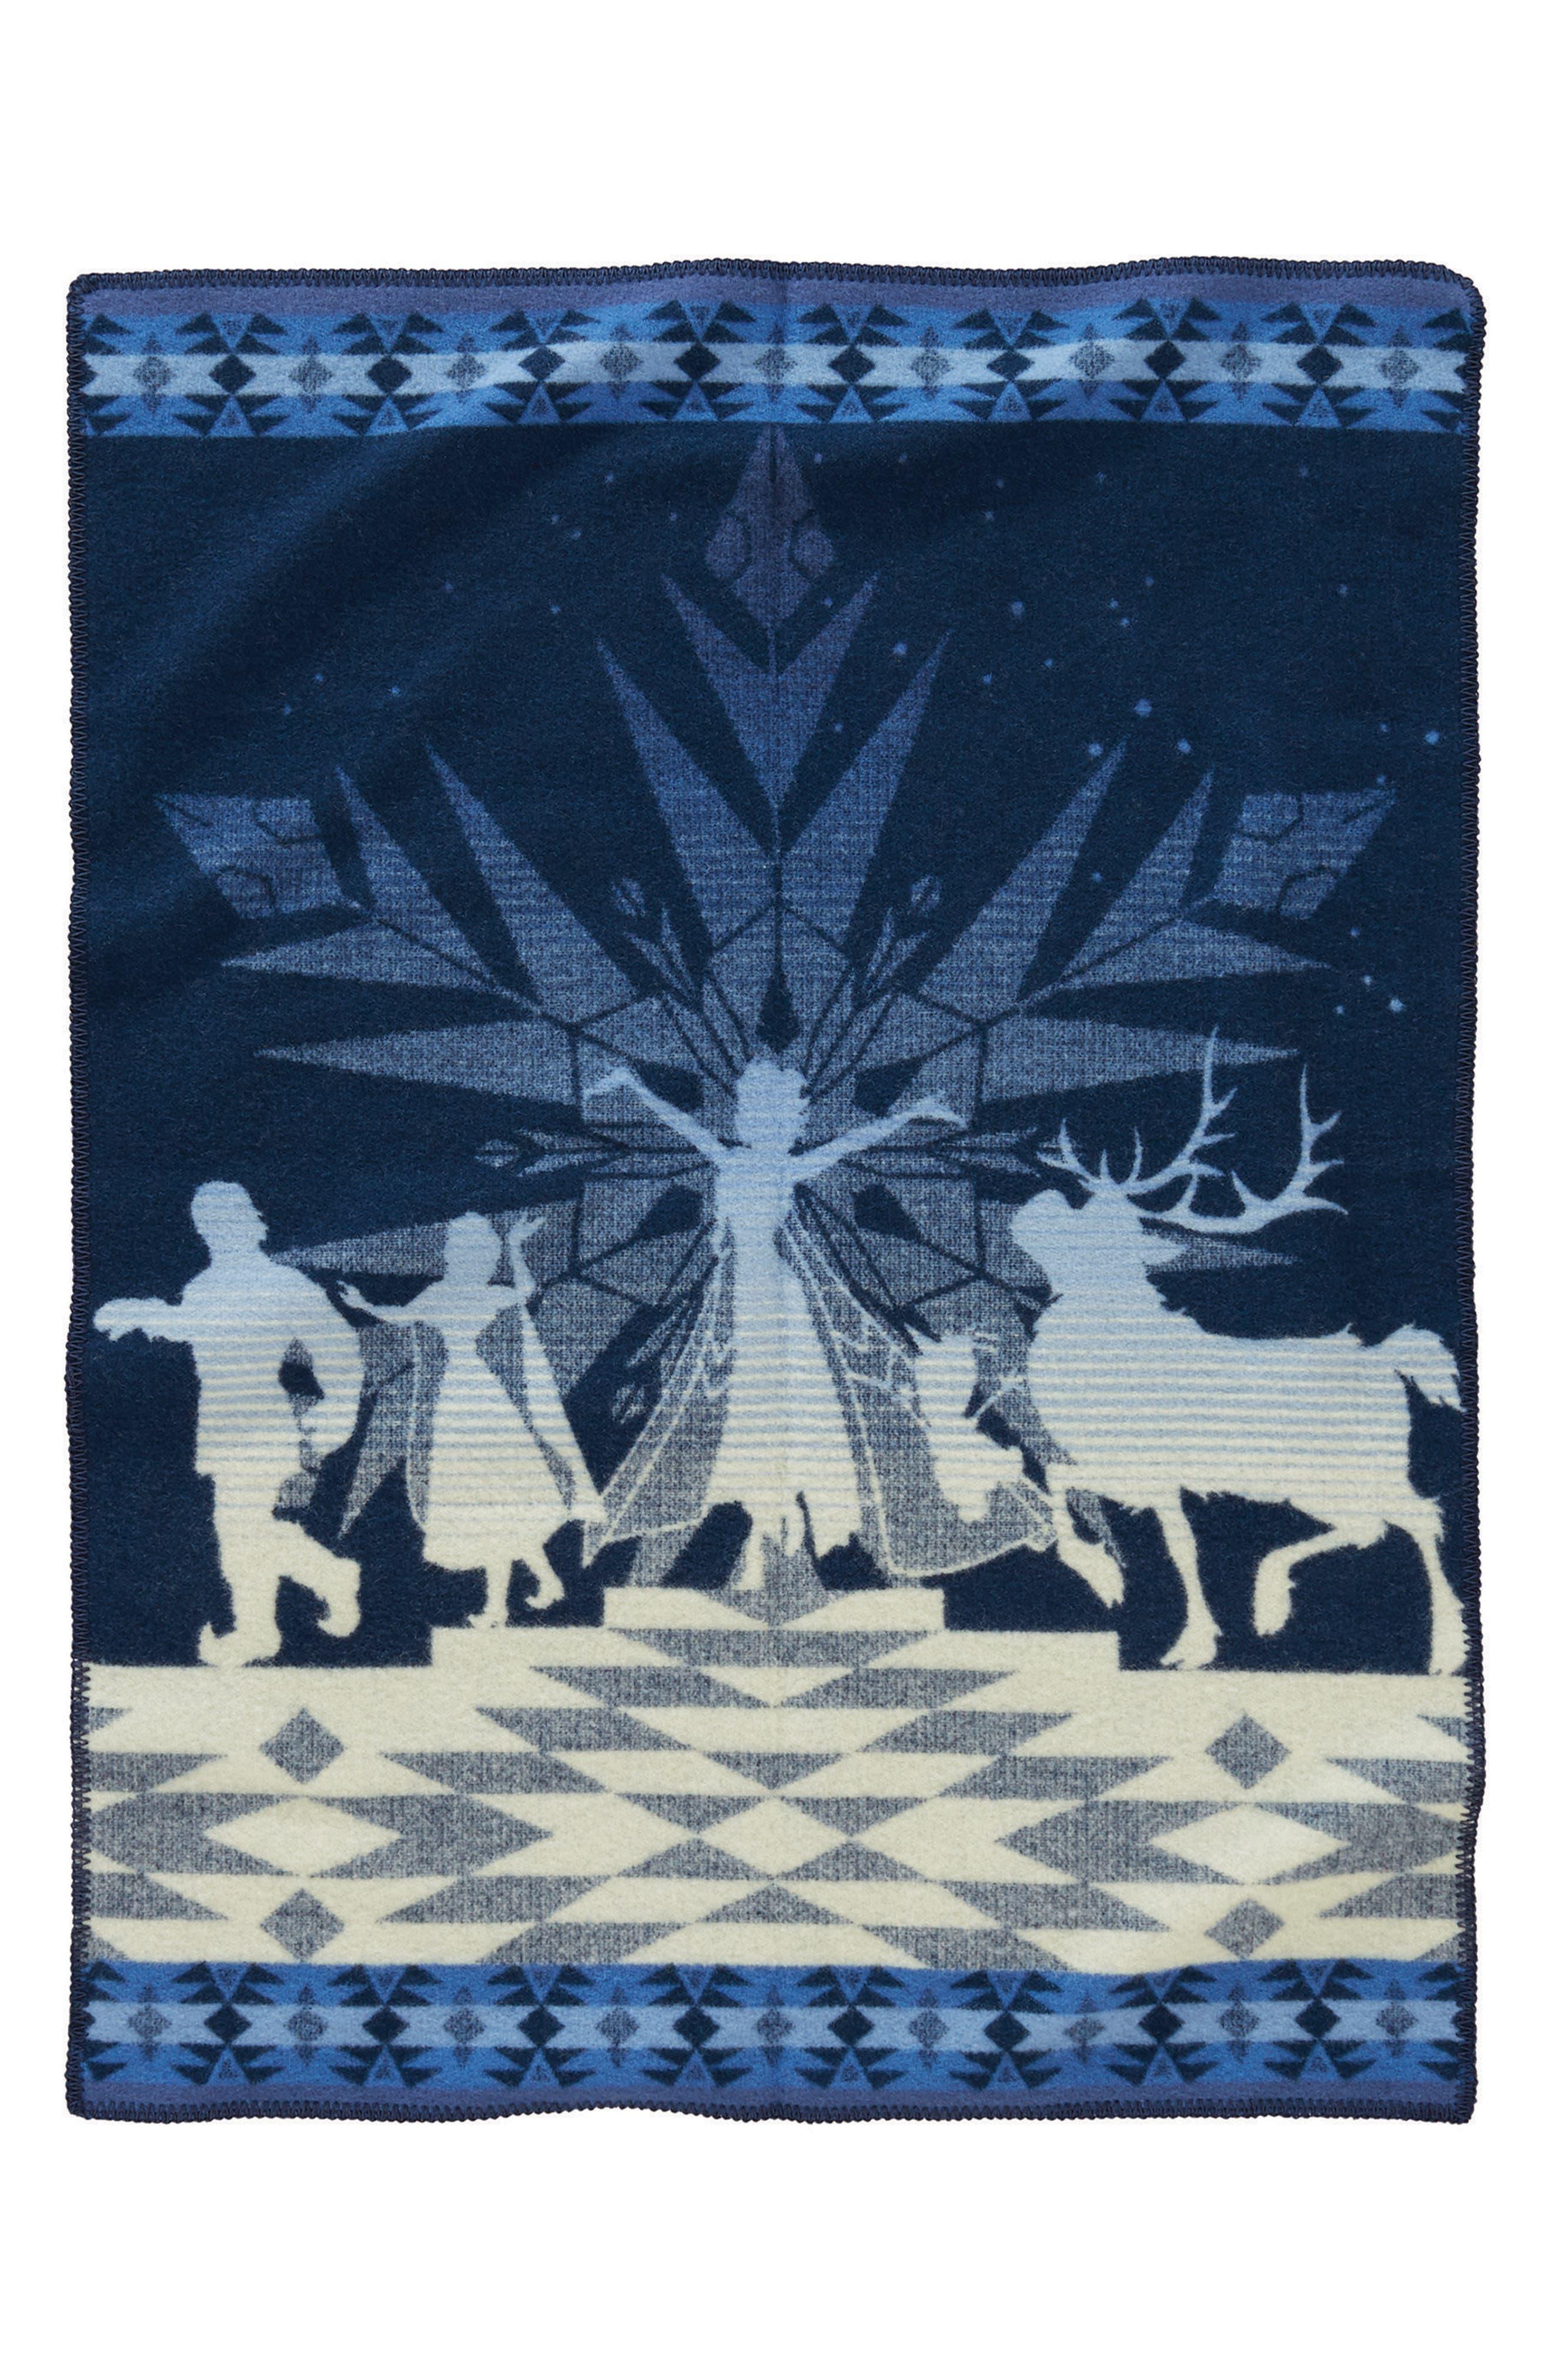 Disney 'Frozen' Friendship Blanket,                         Main,                         color, Navy